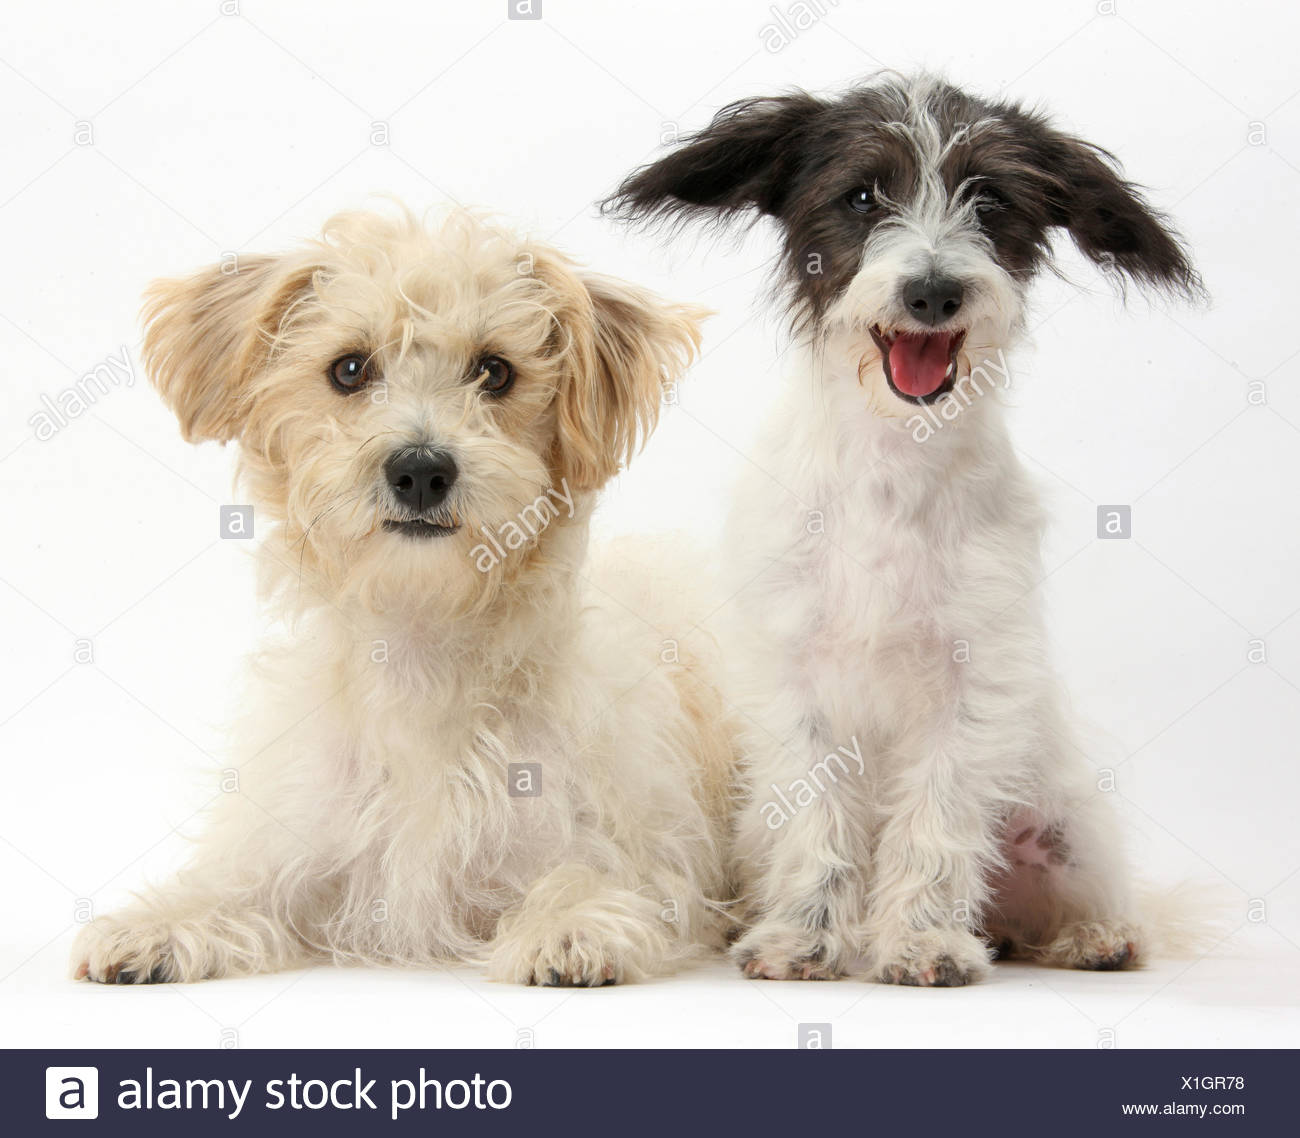 Animal Poo Stock Photos & Animal Poo Stock Images - Alamy